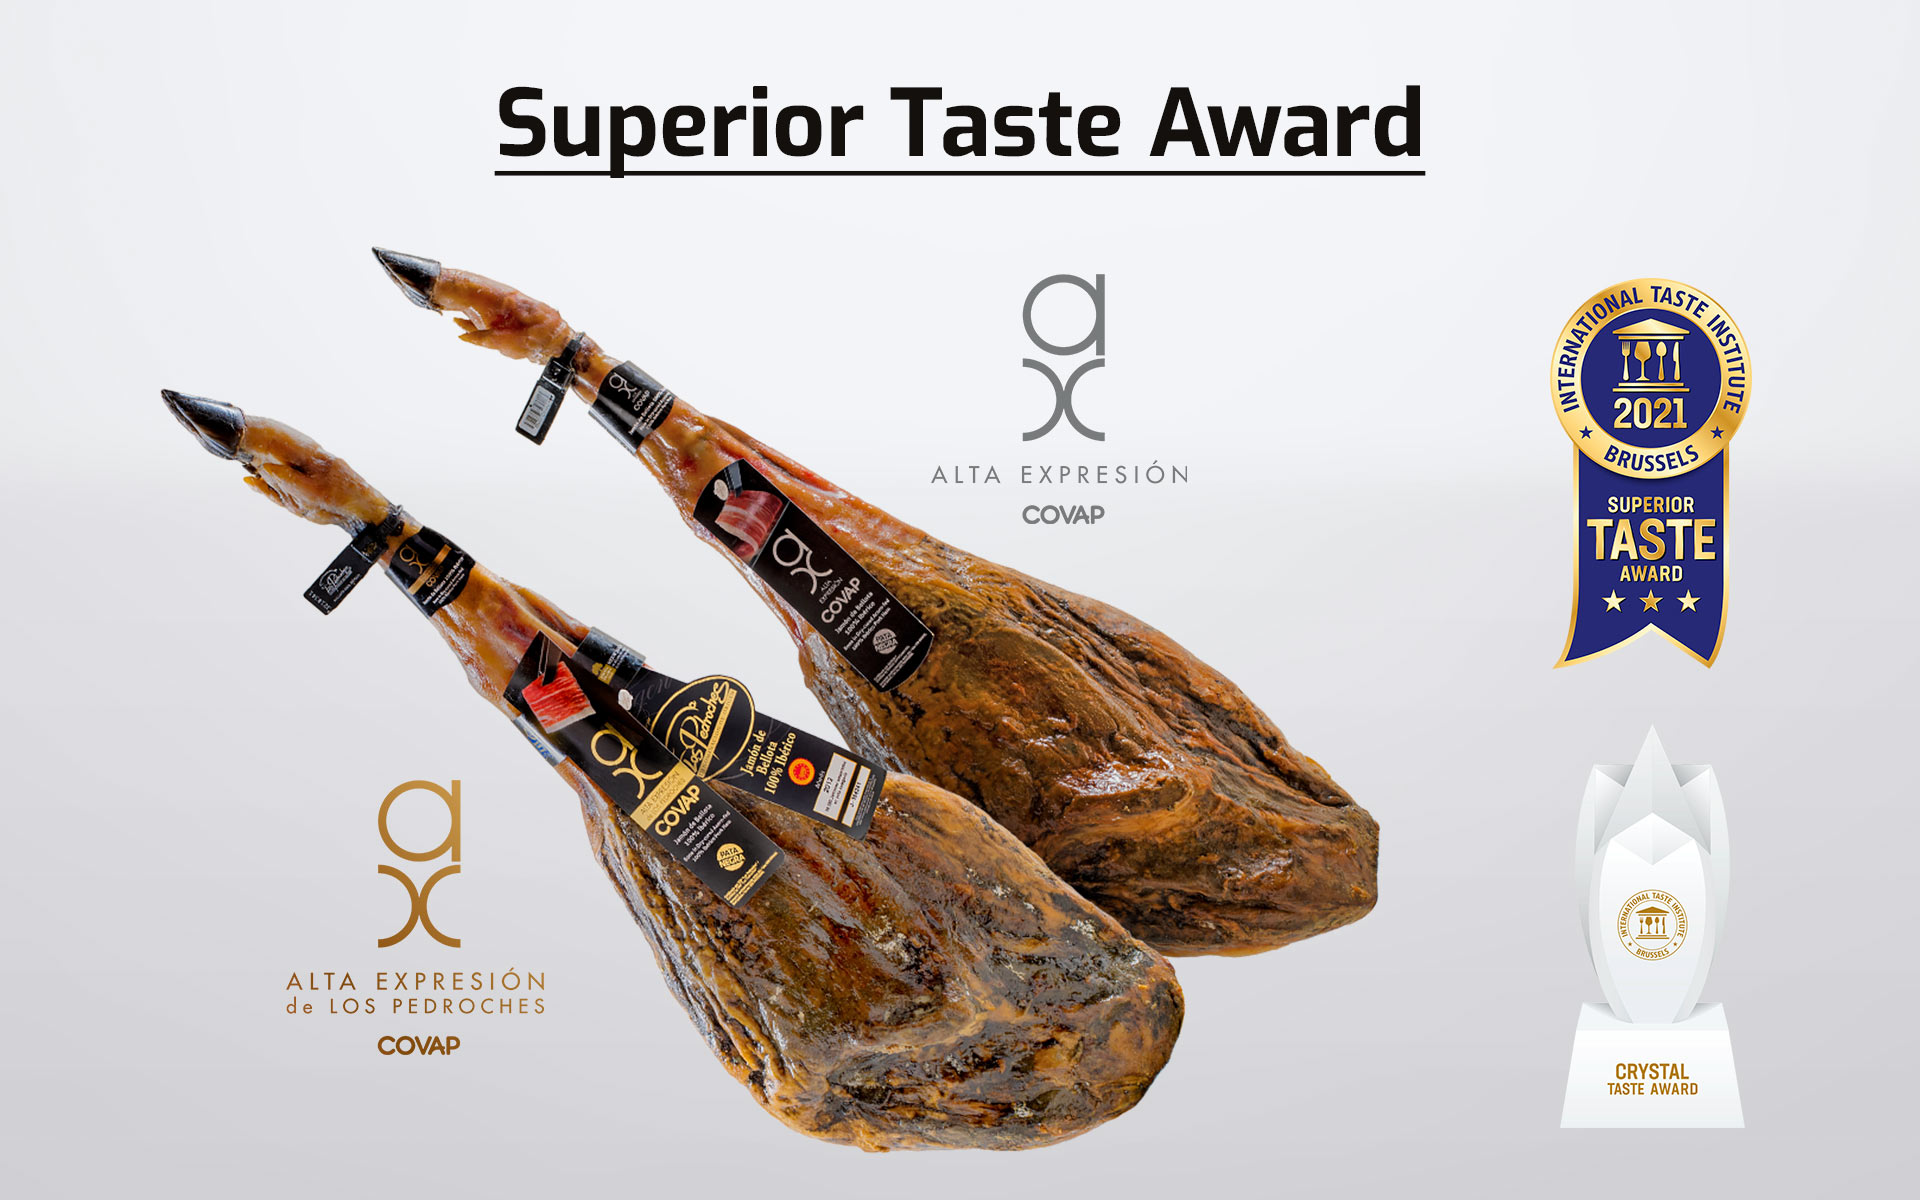 Superior Taste Award 2021